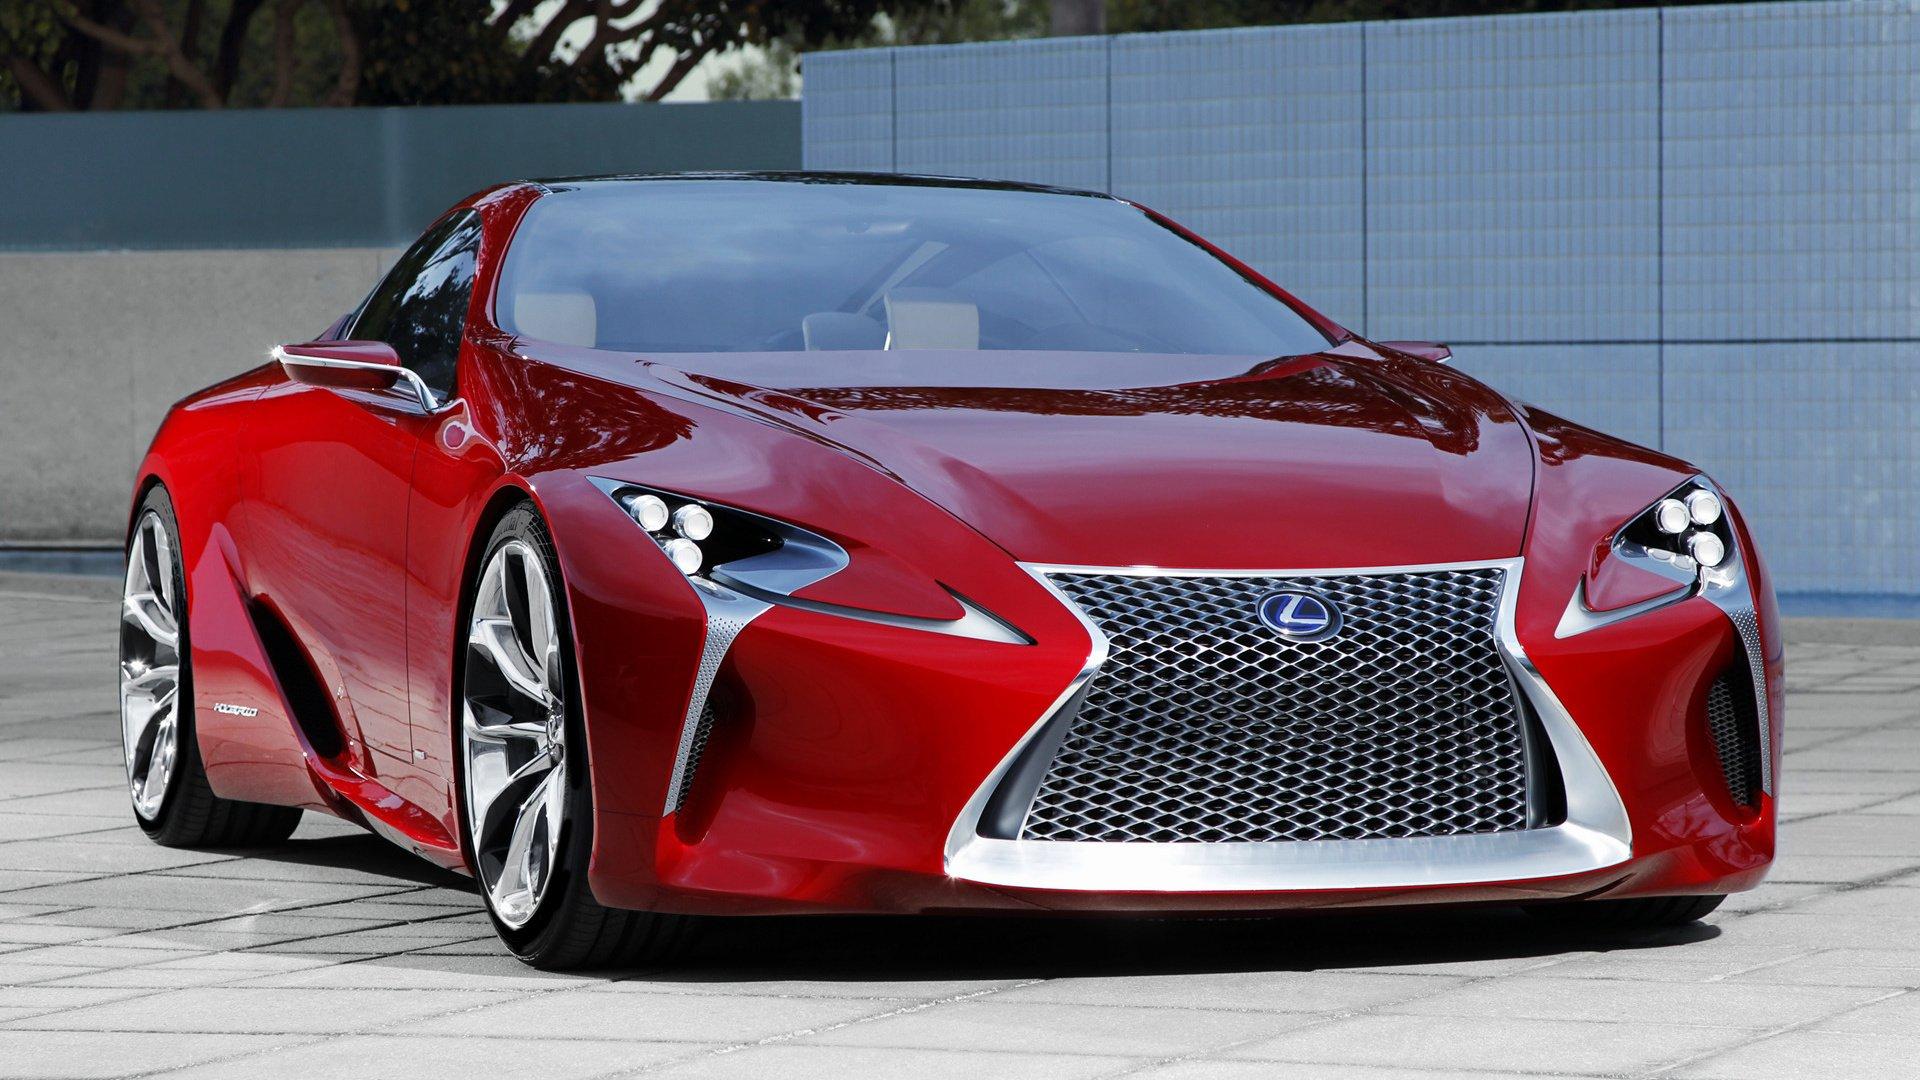 2012 Lexus LF-LC Concept Full HD Bakgrund and Bakgrund | 1920x1080 ...